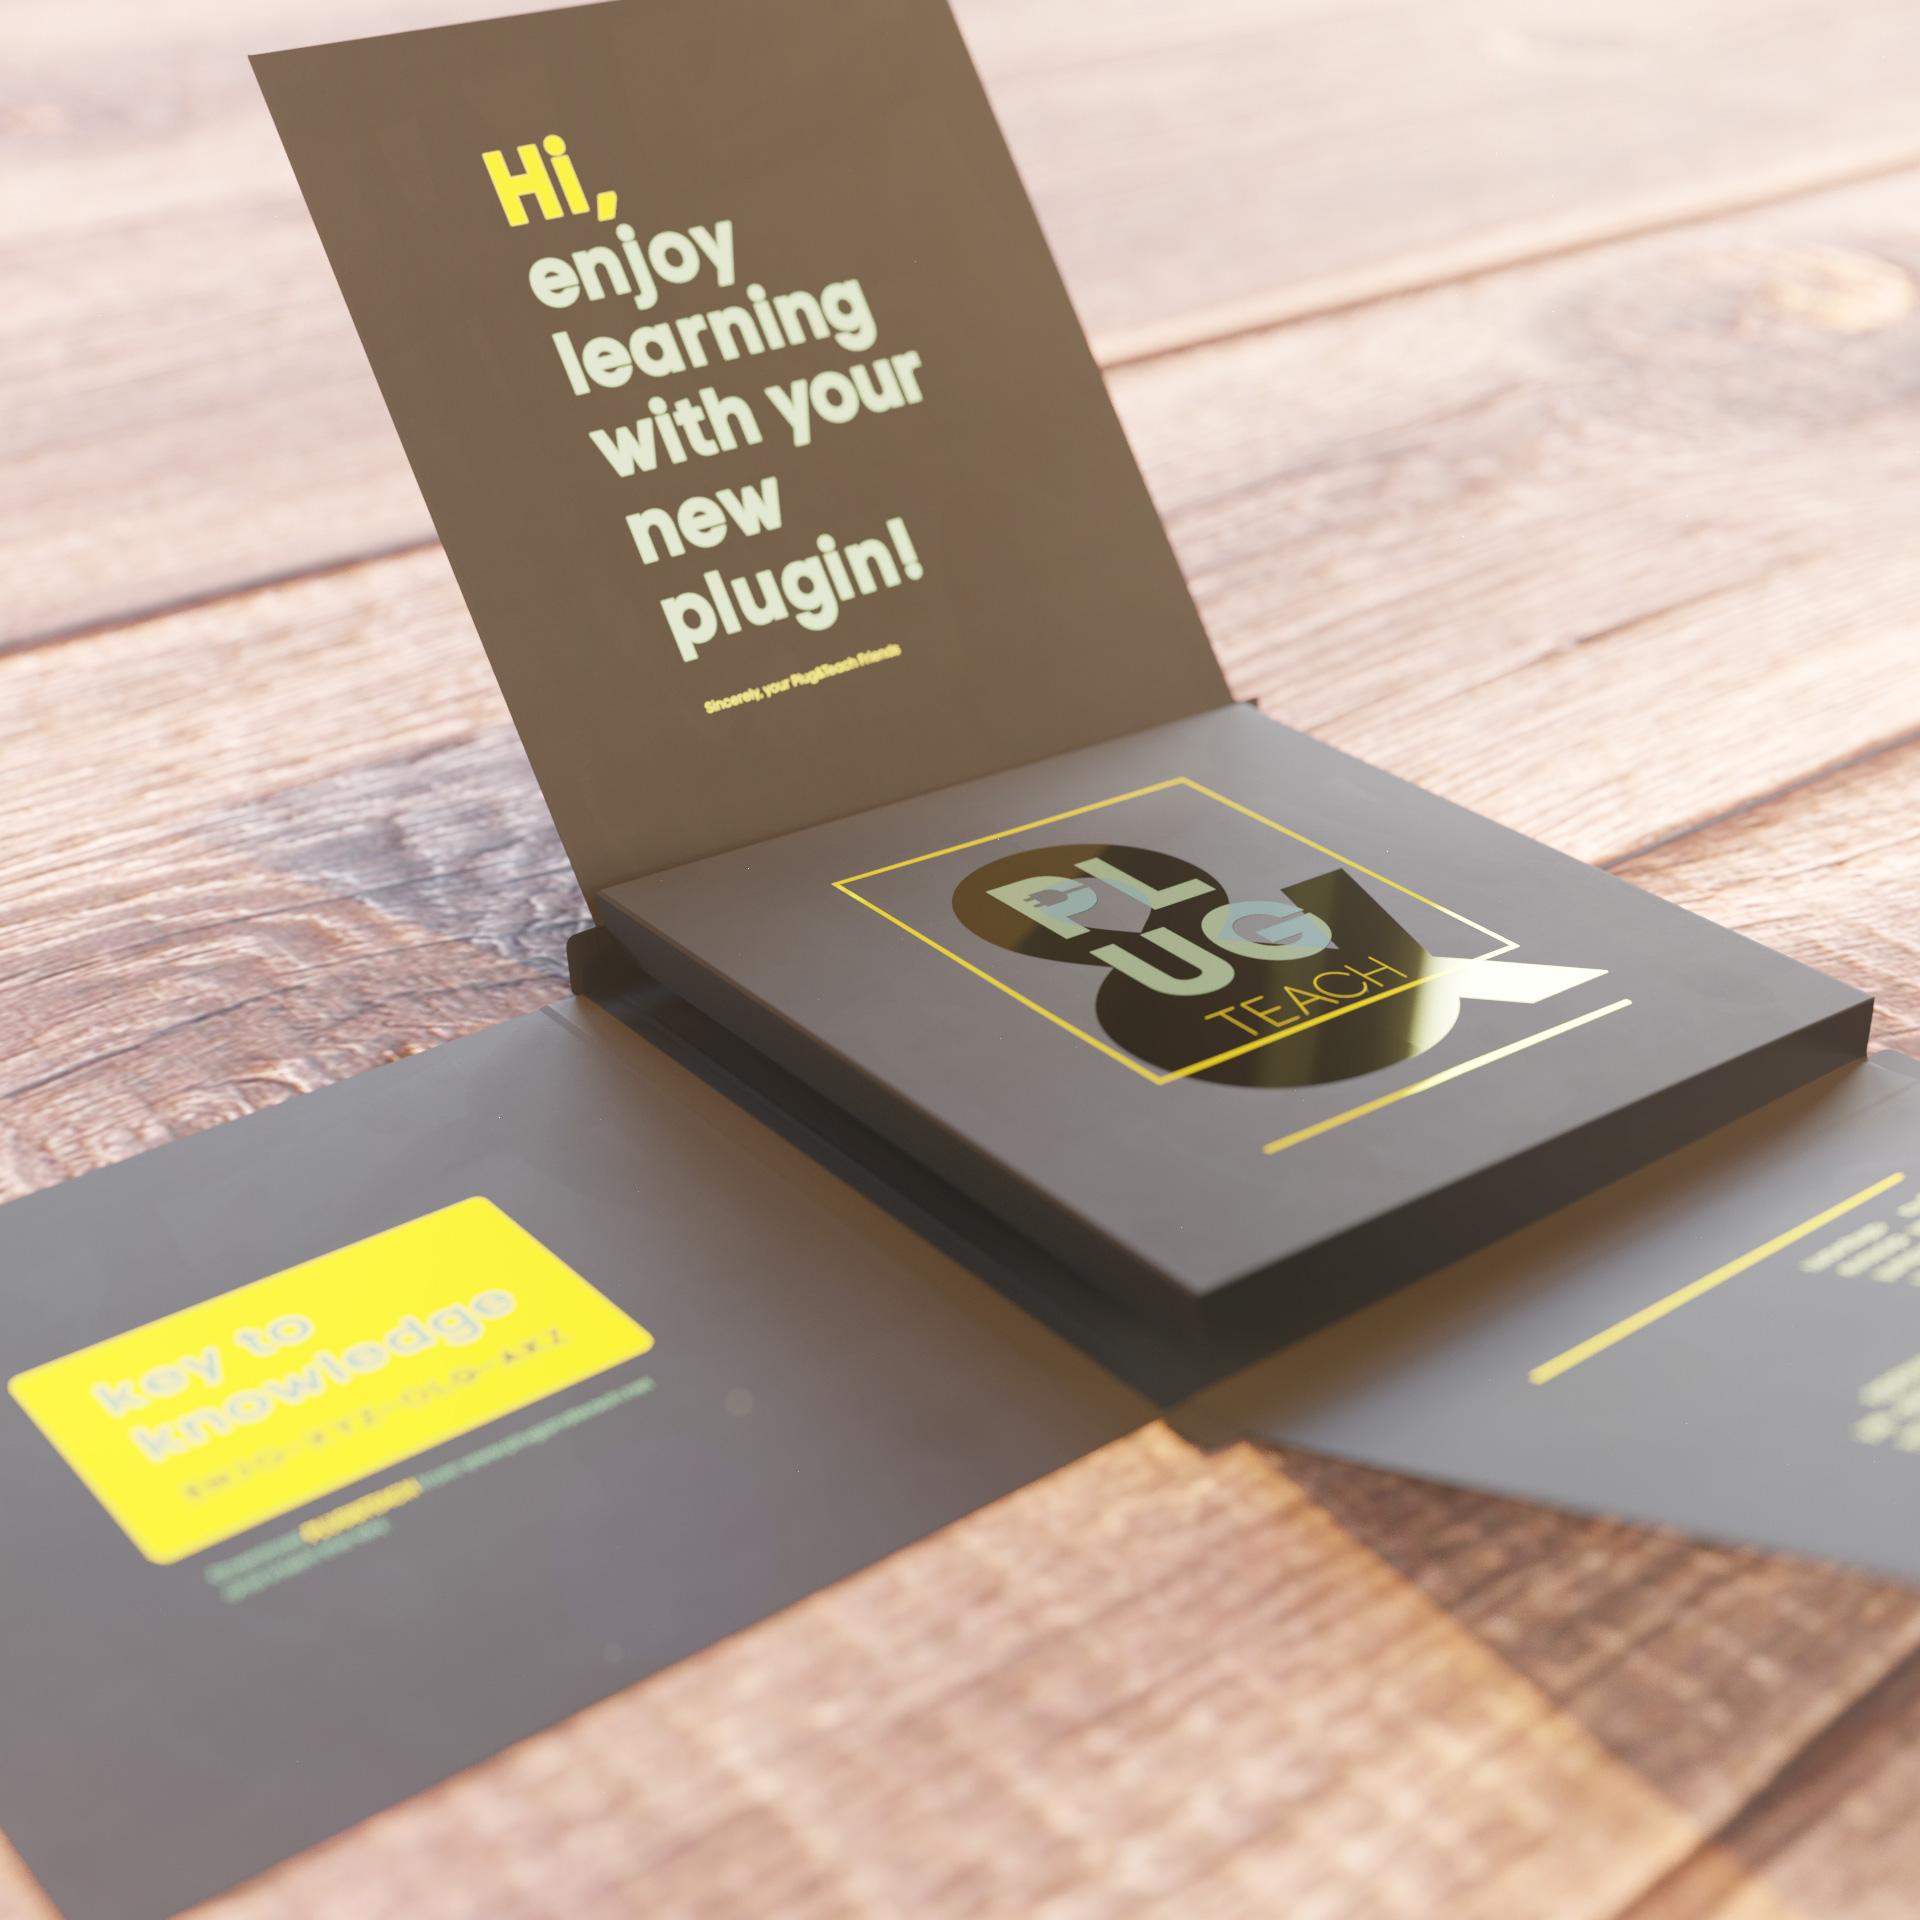 e-learning software box